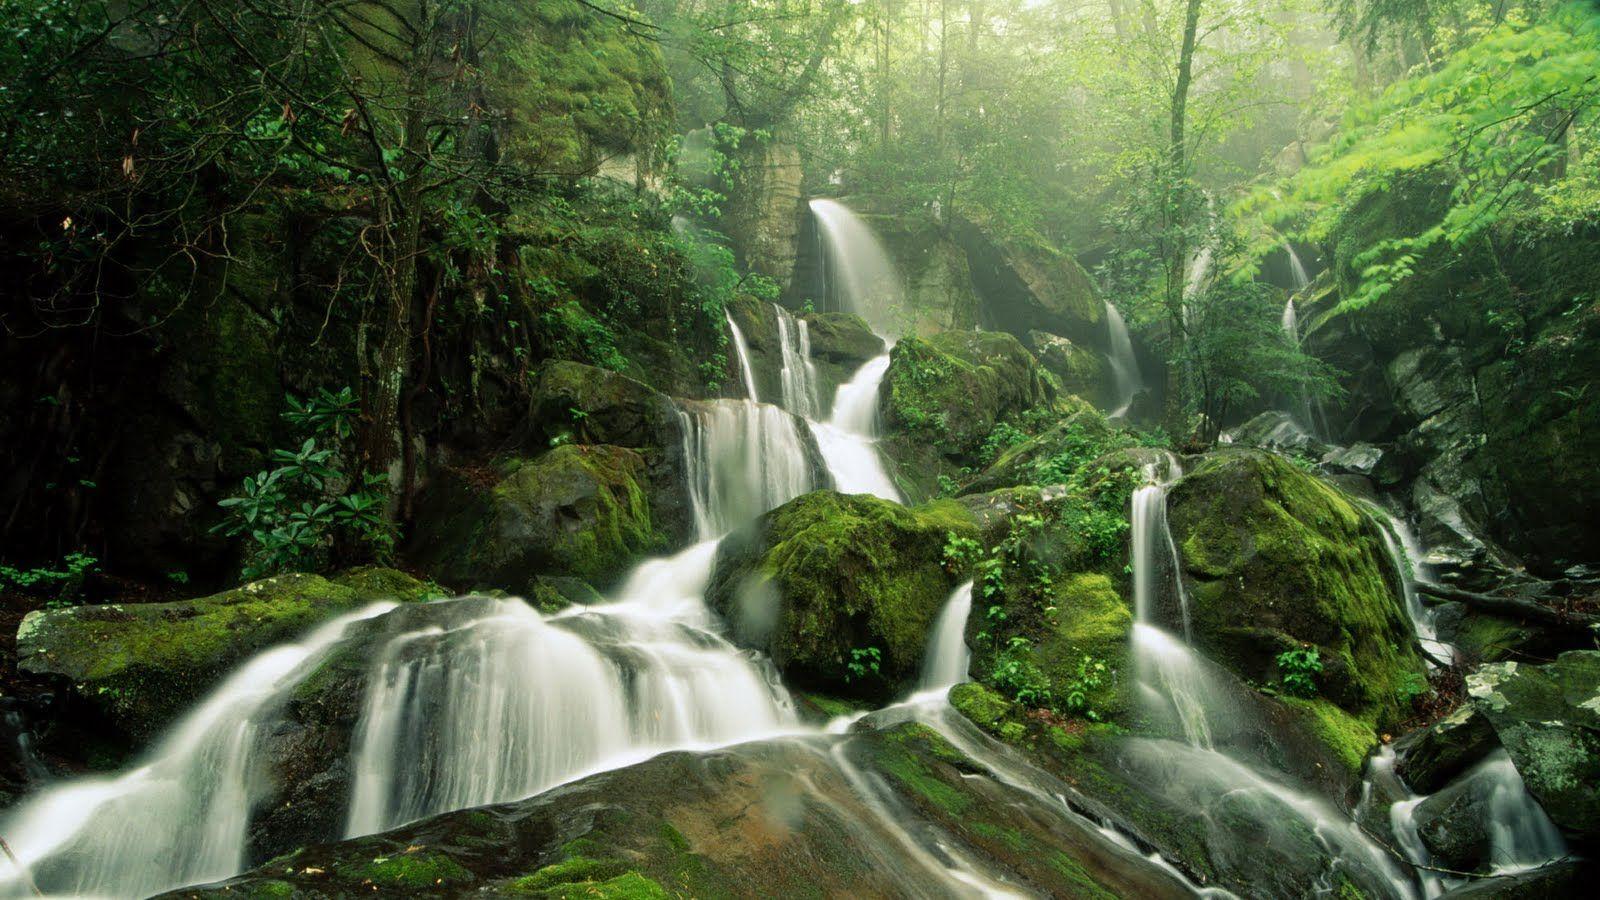 Nature Hd Wallpapers 1080p Waterfall Wallpaper Waterfall Beautiful Nature Wallpaper